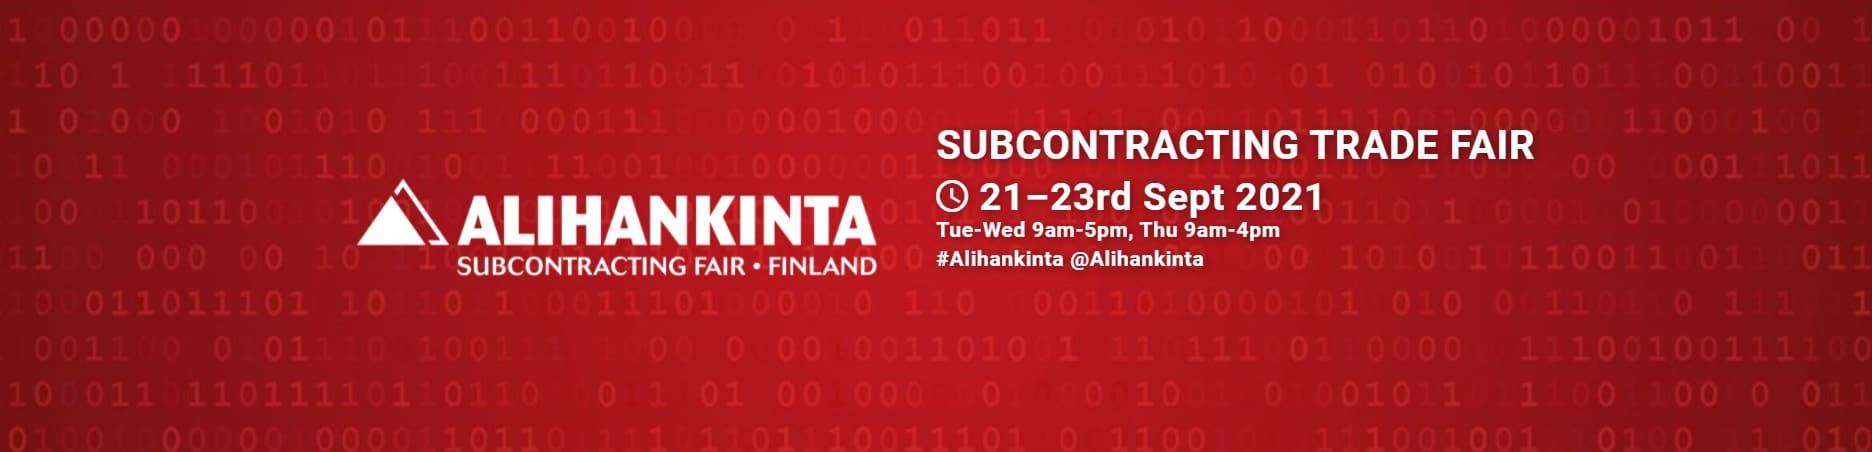 Alihankinta 2021 exhibition